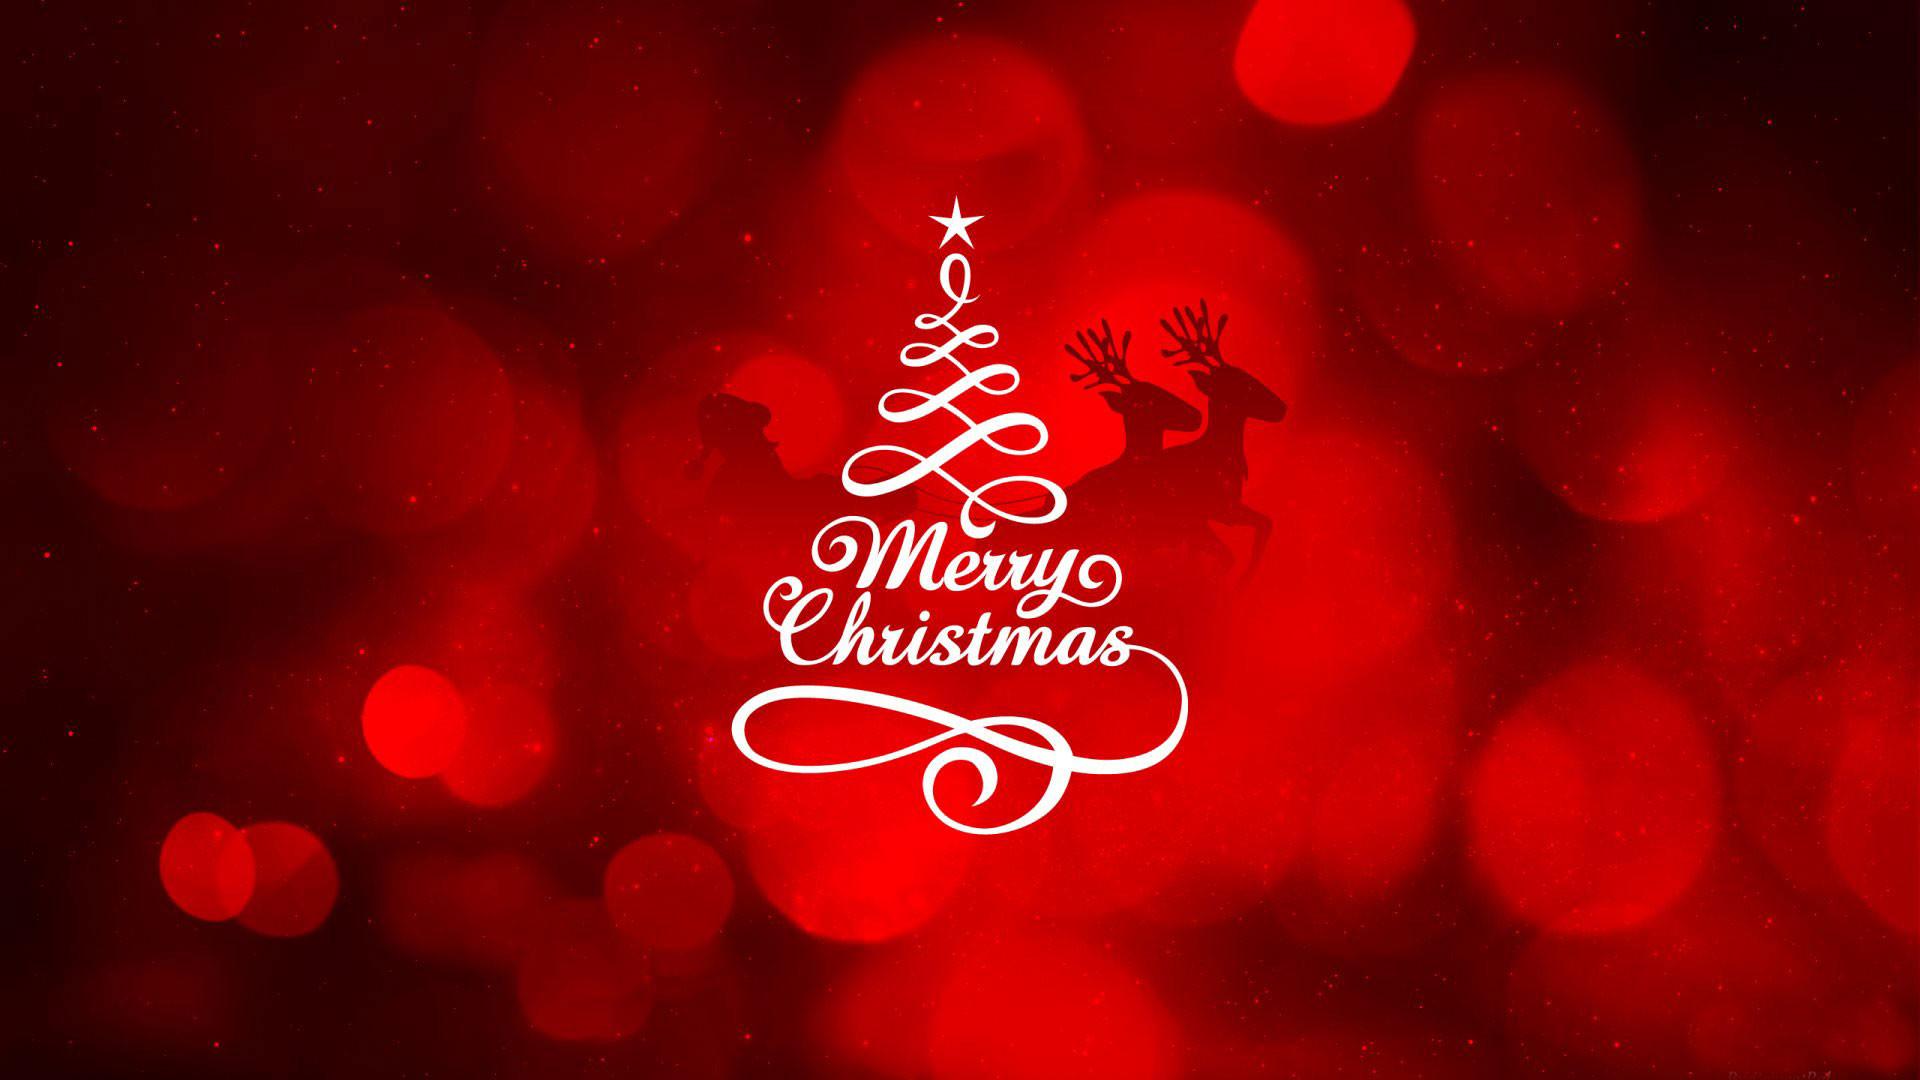 hd pics photos christmas merry christmas tree red desktop background  wallpaper